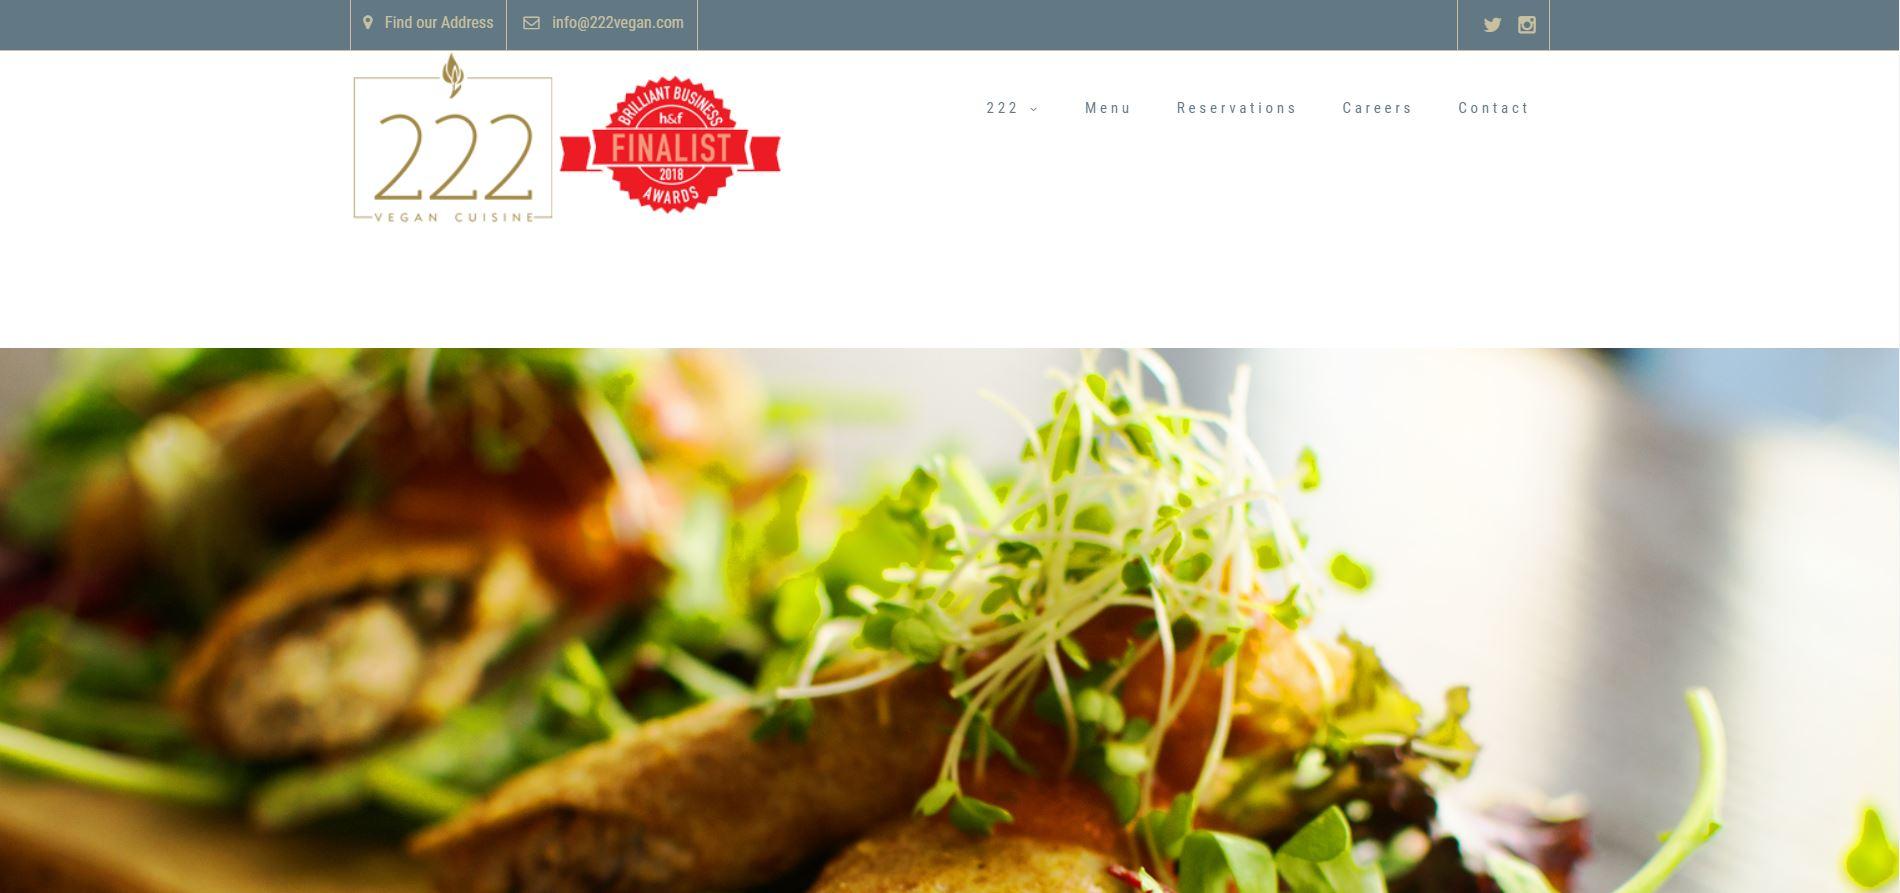 222 vegan cuisine, Kensington